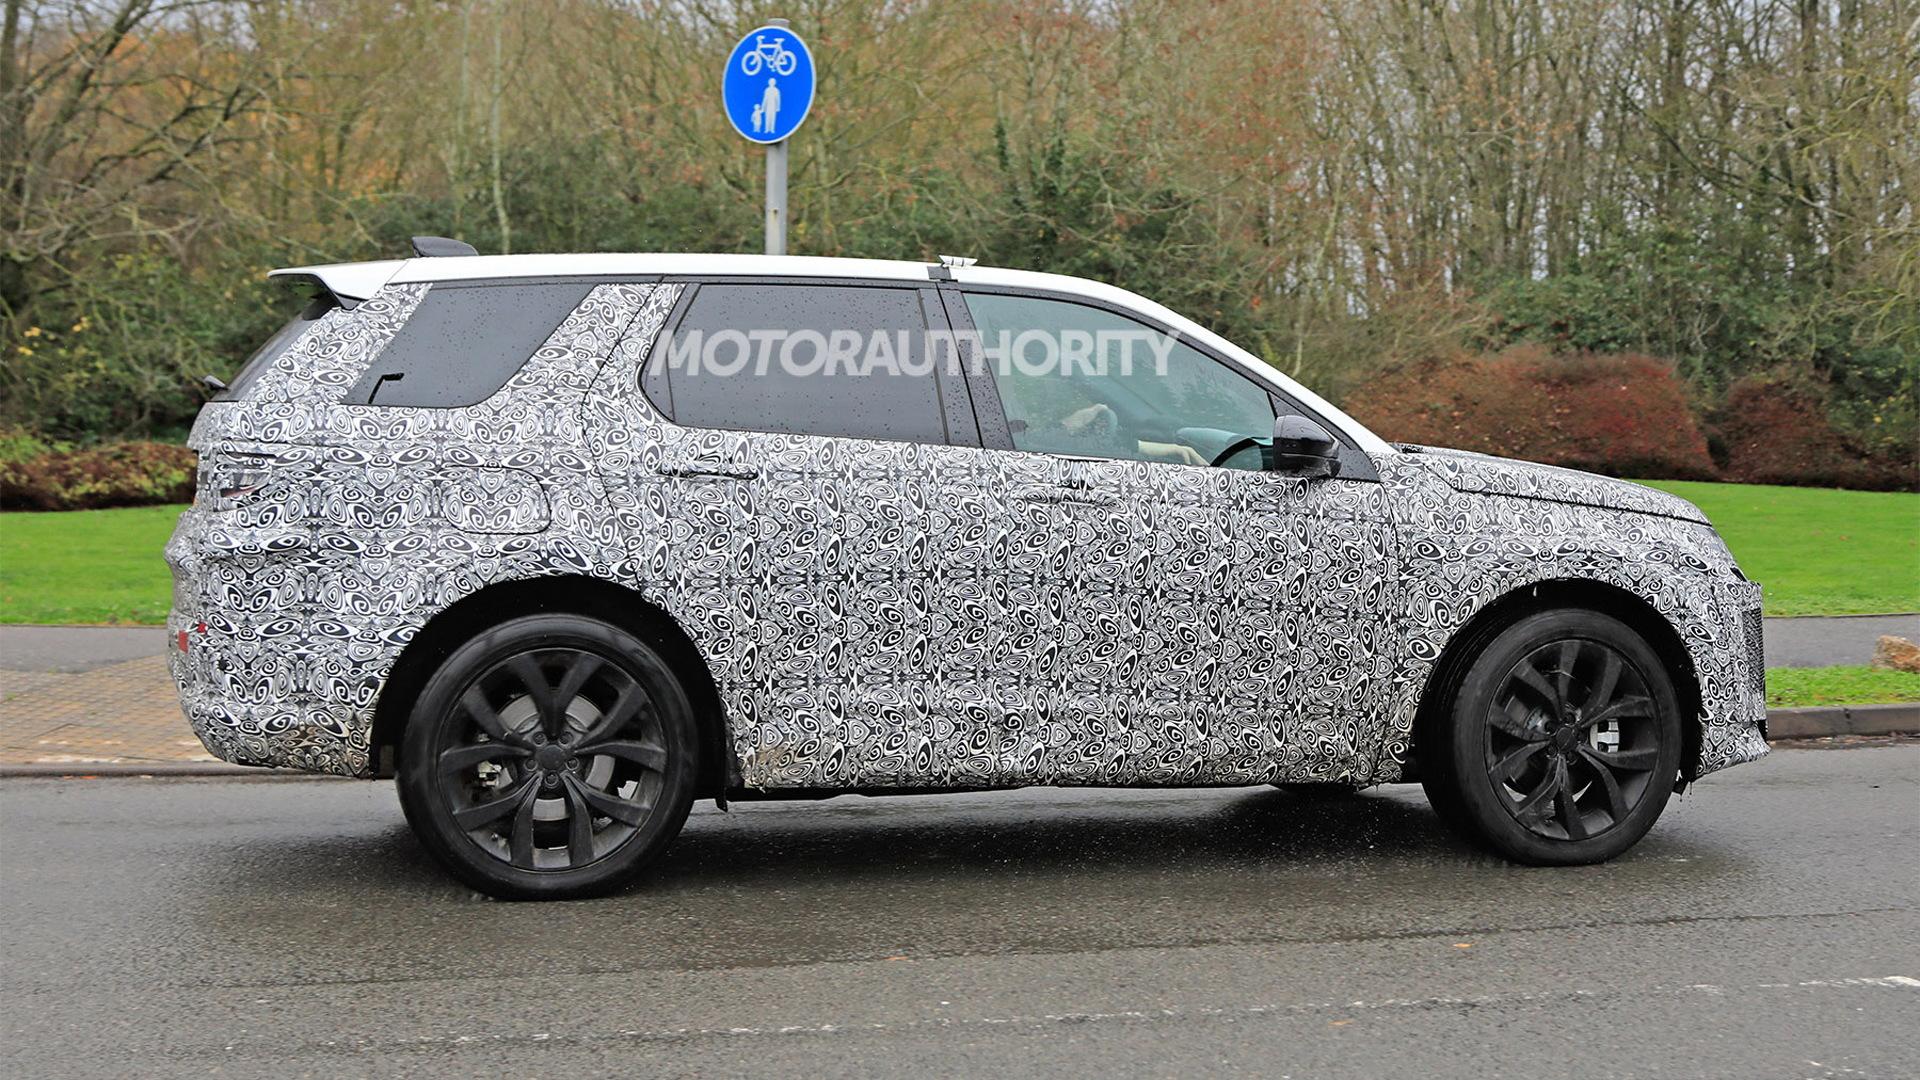 2020 Land Rover Discovery Sport facelift spy shots - Image via S. Baldauf/SB-Medien